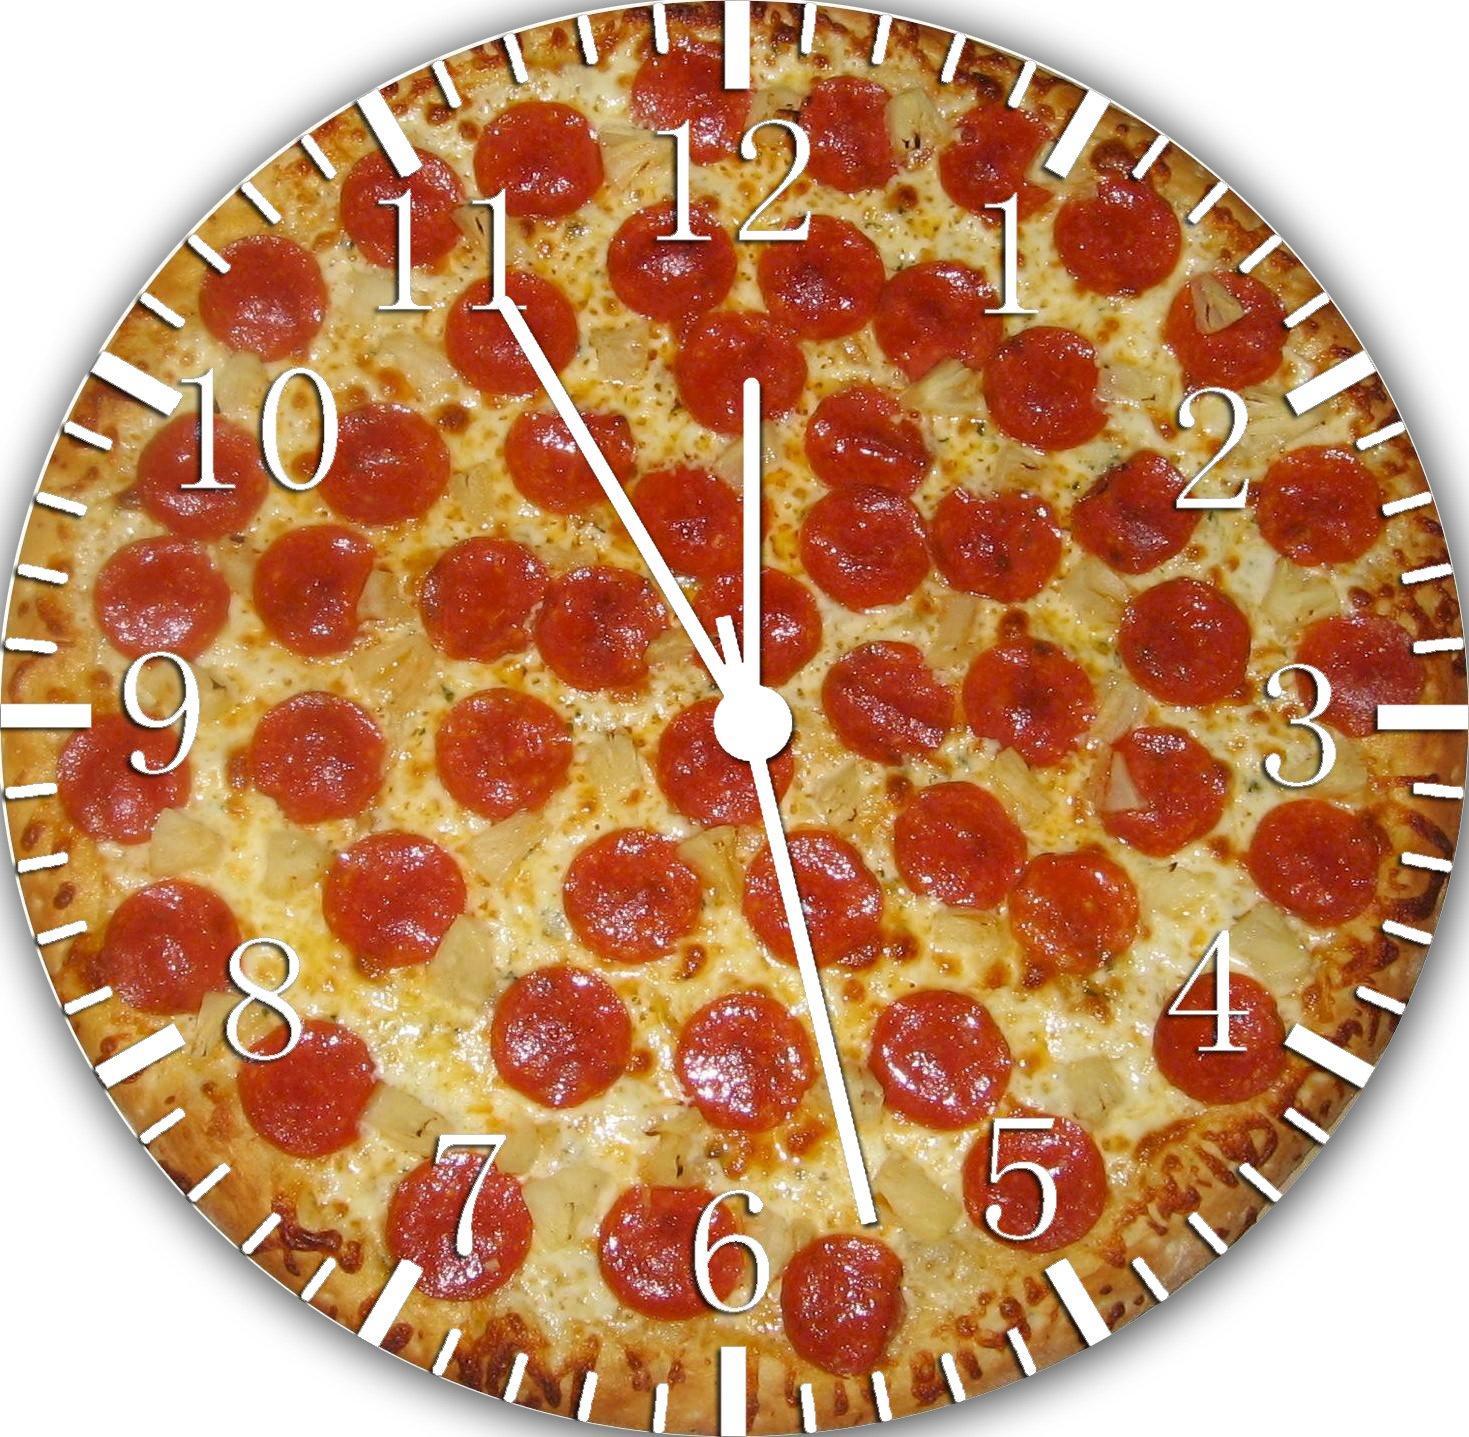 Pizza Frameless Borderless Wall Clock E158 Nice For Gift or Room Wall Decor